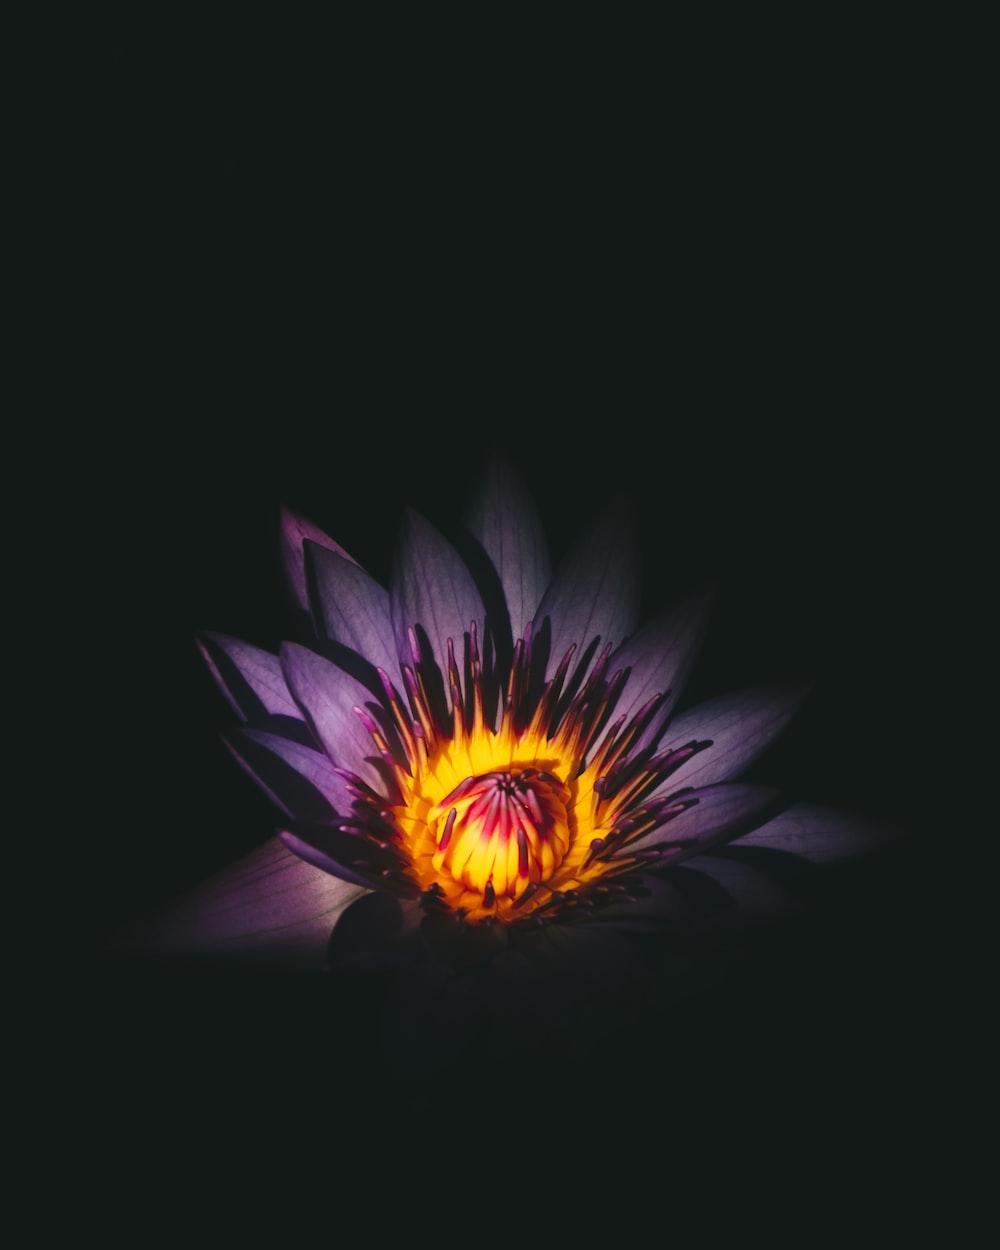 Dark purple flower photo by ameen fahmy ameenfahmy on unsplash closeup photography of flower mightylinksfo